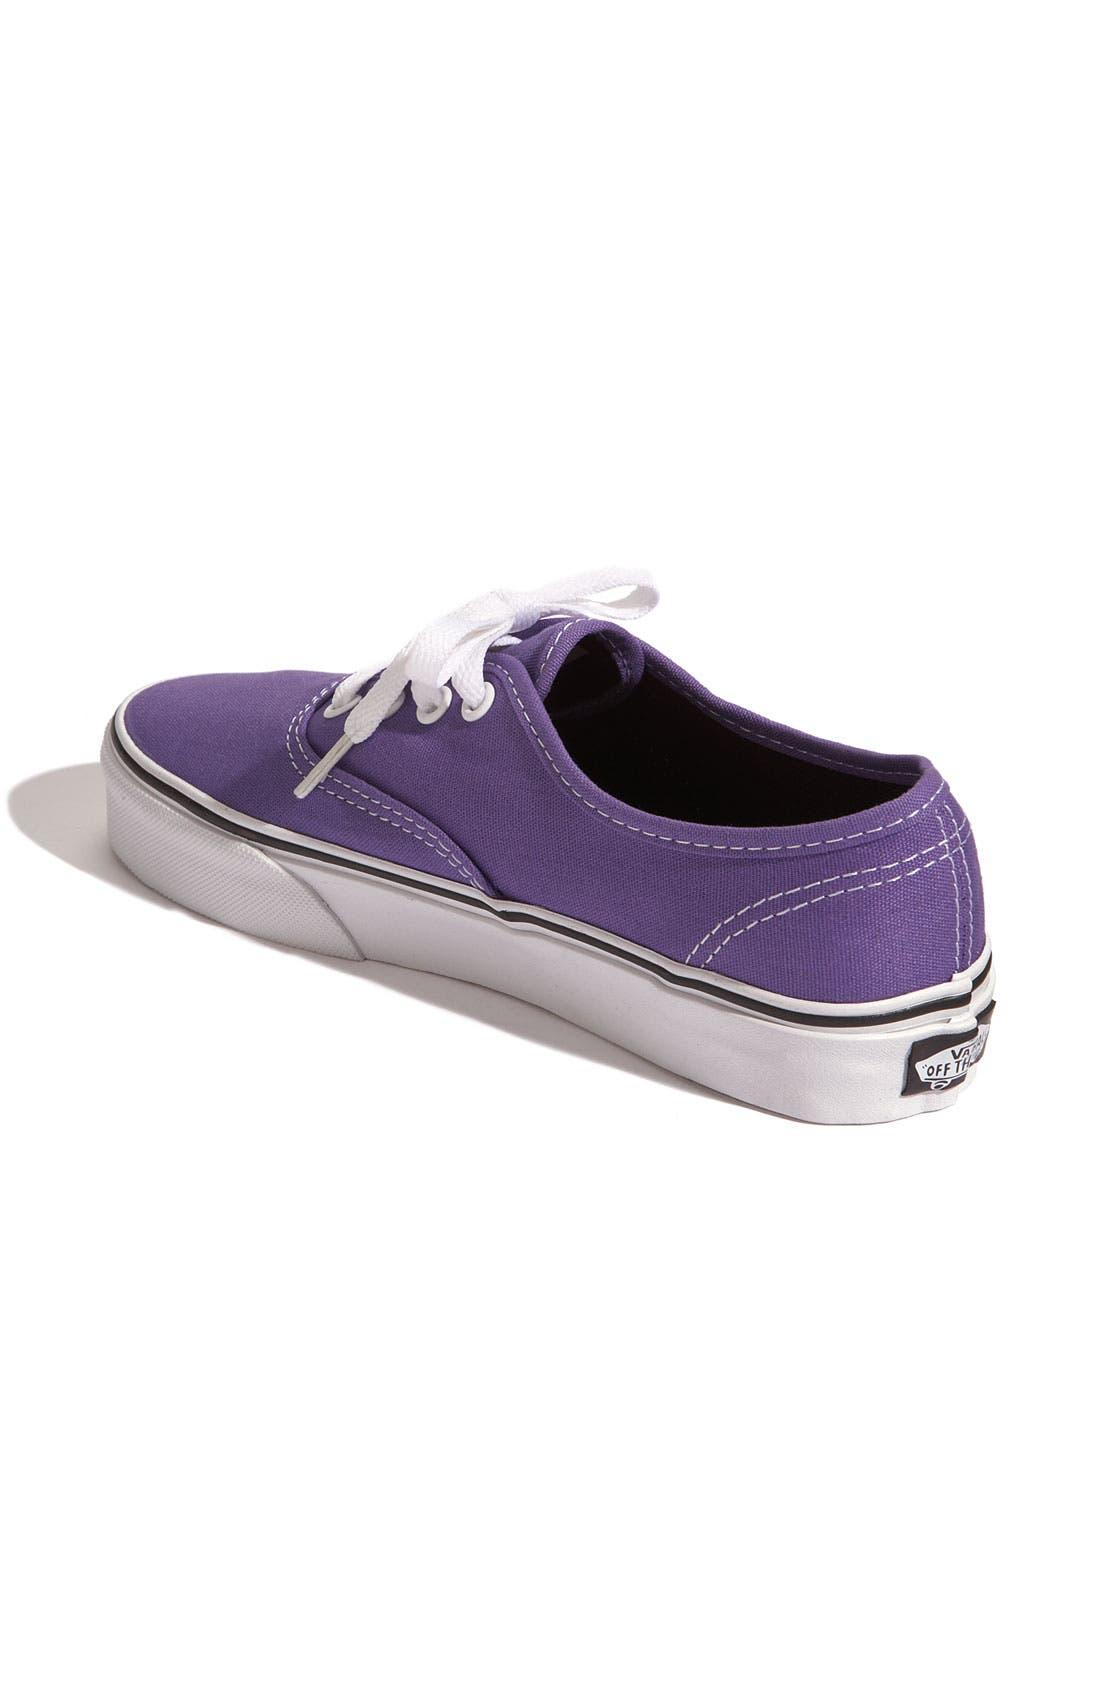 ,                             'Authentic' Sneaker,                             Alternate thumbnail 675, color,                             520